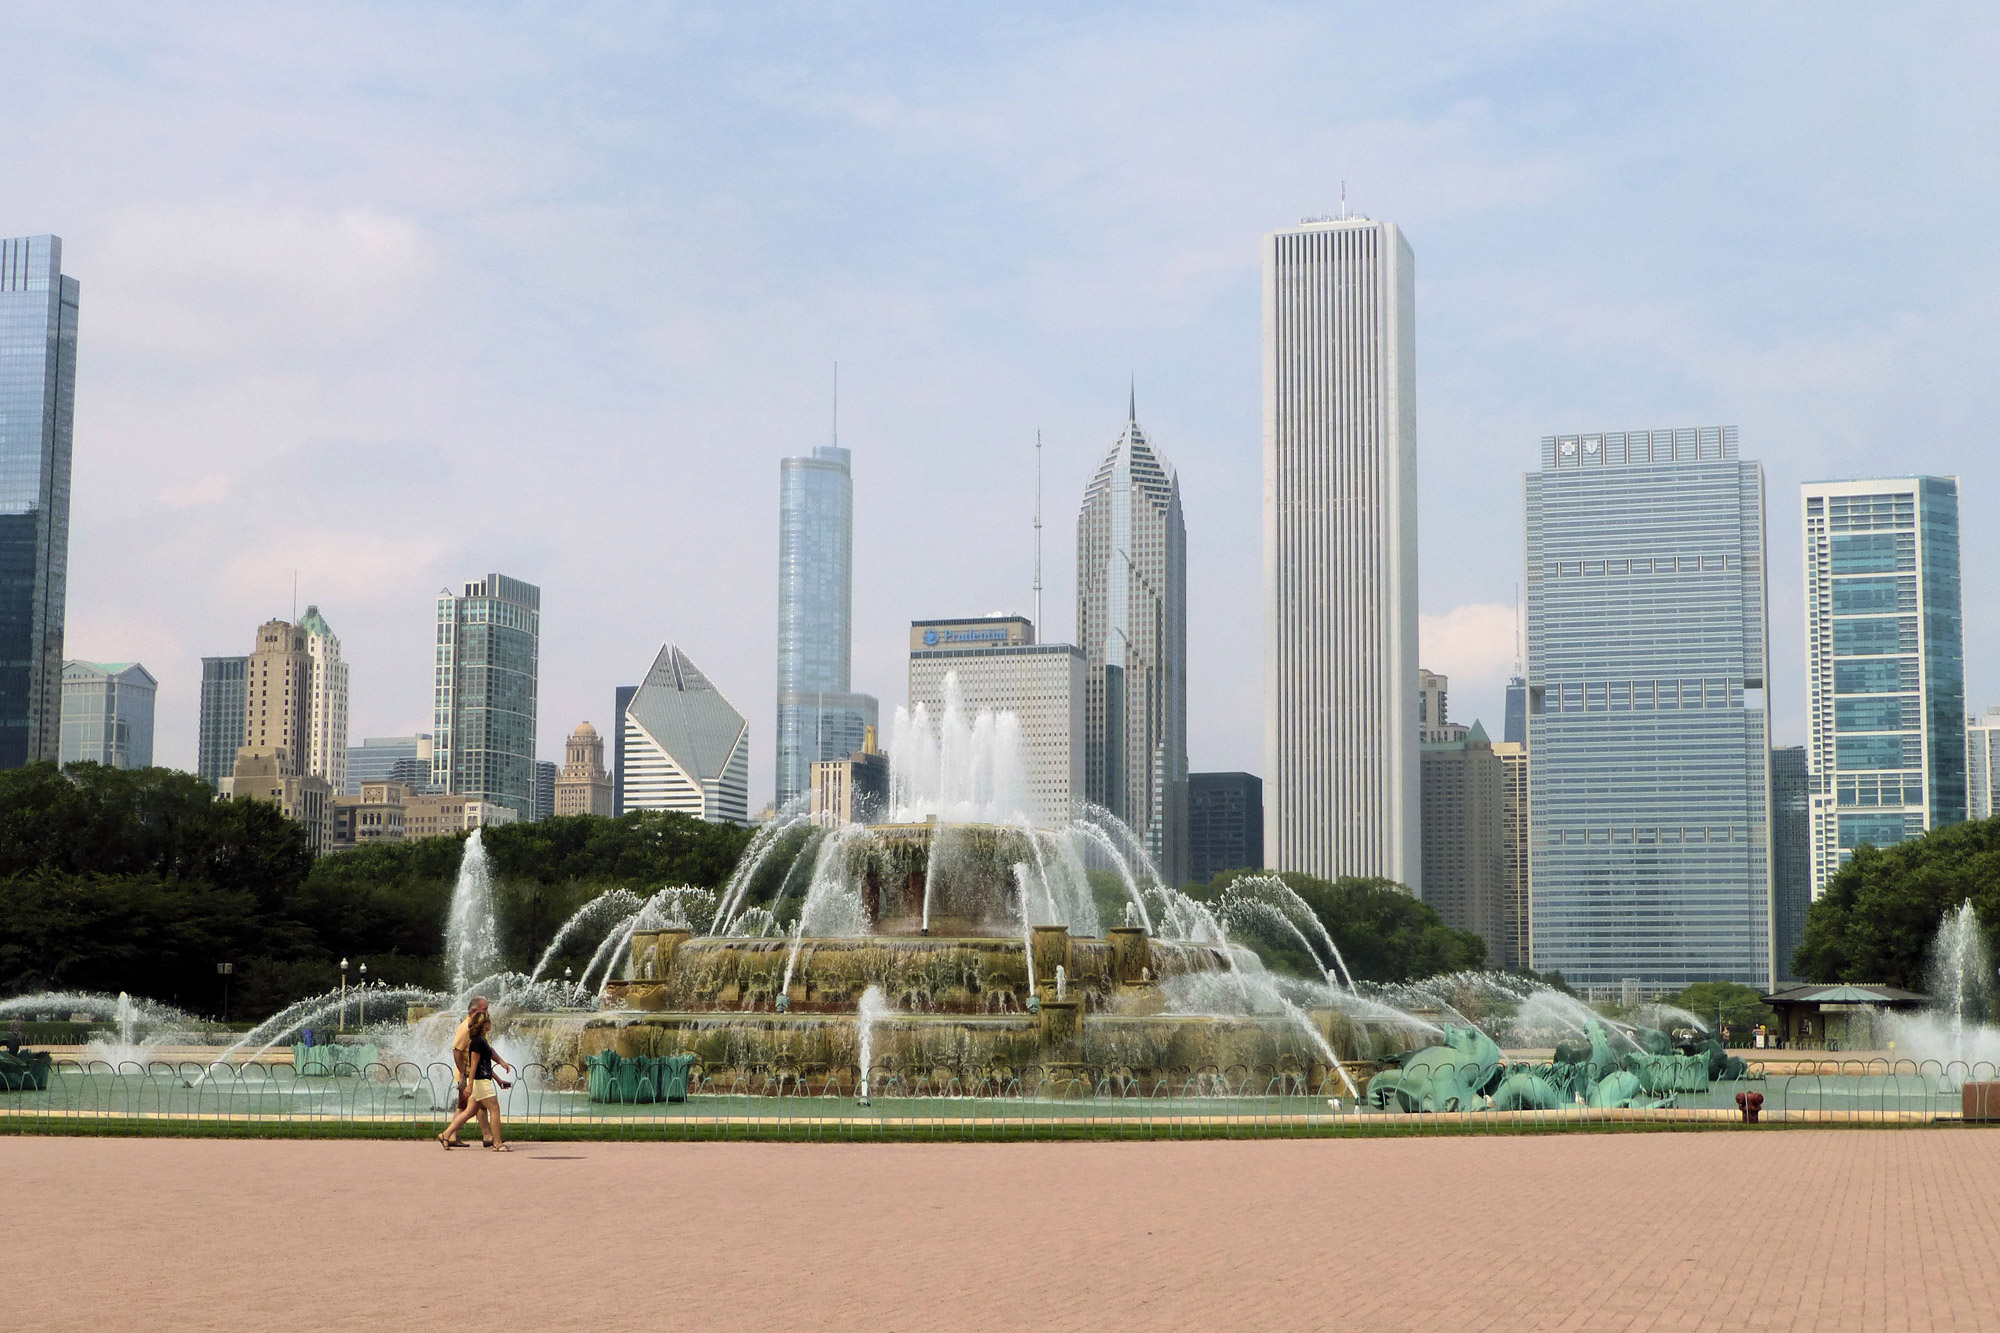 Anika - USA - Chicago